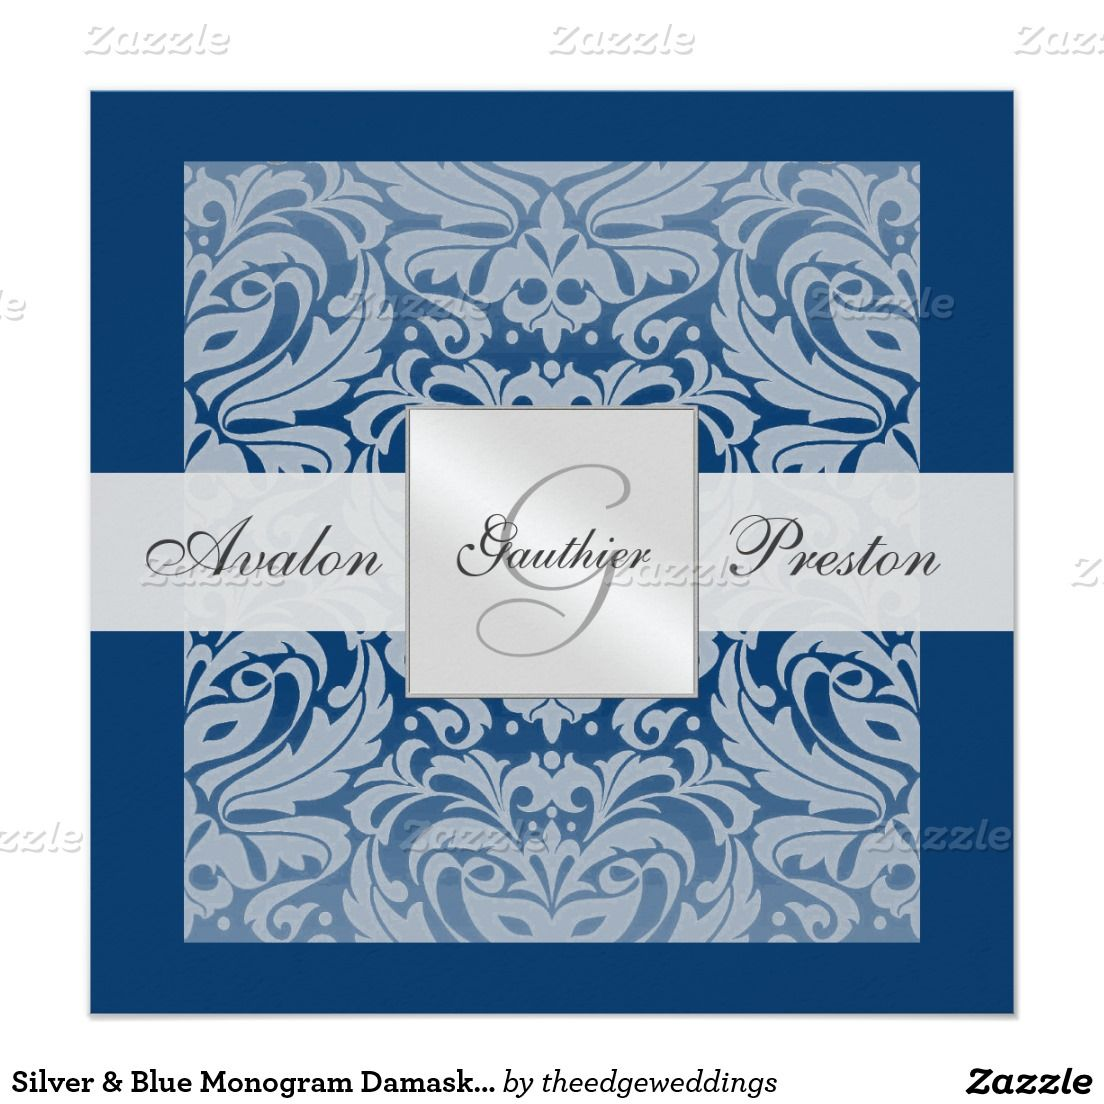 silver blue monogram damask border invitation wedding winter